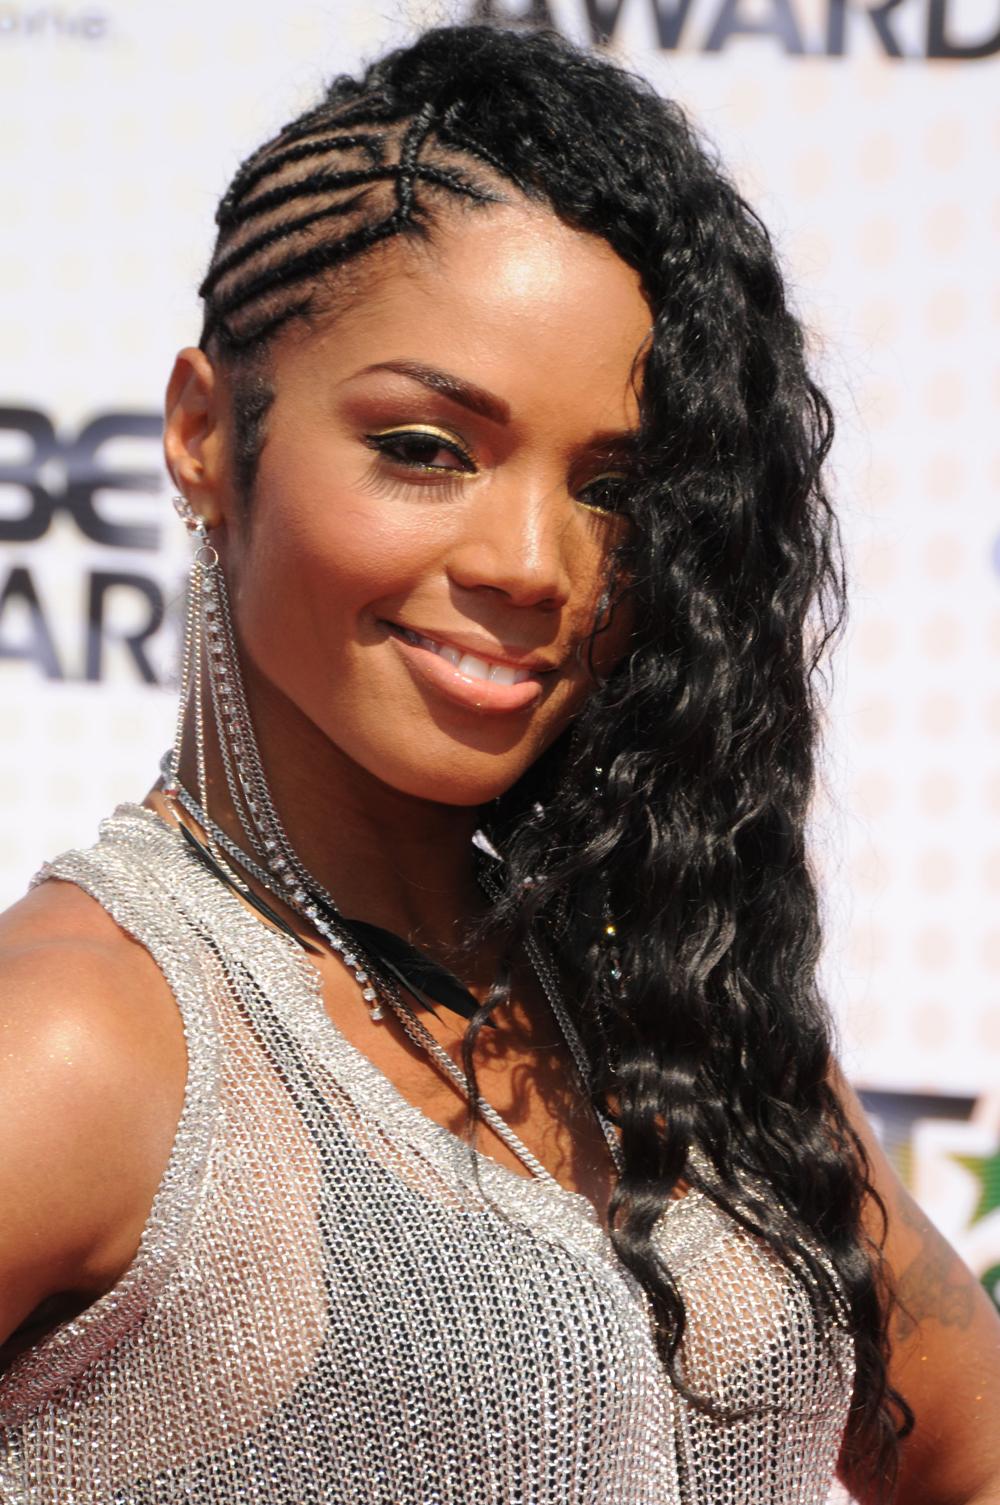 Rasheeda Hair Talk With Ebony C Princess Longing 4 Length